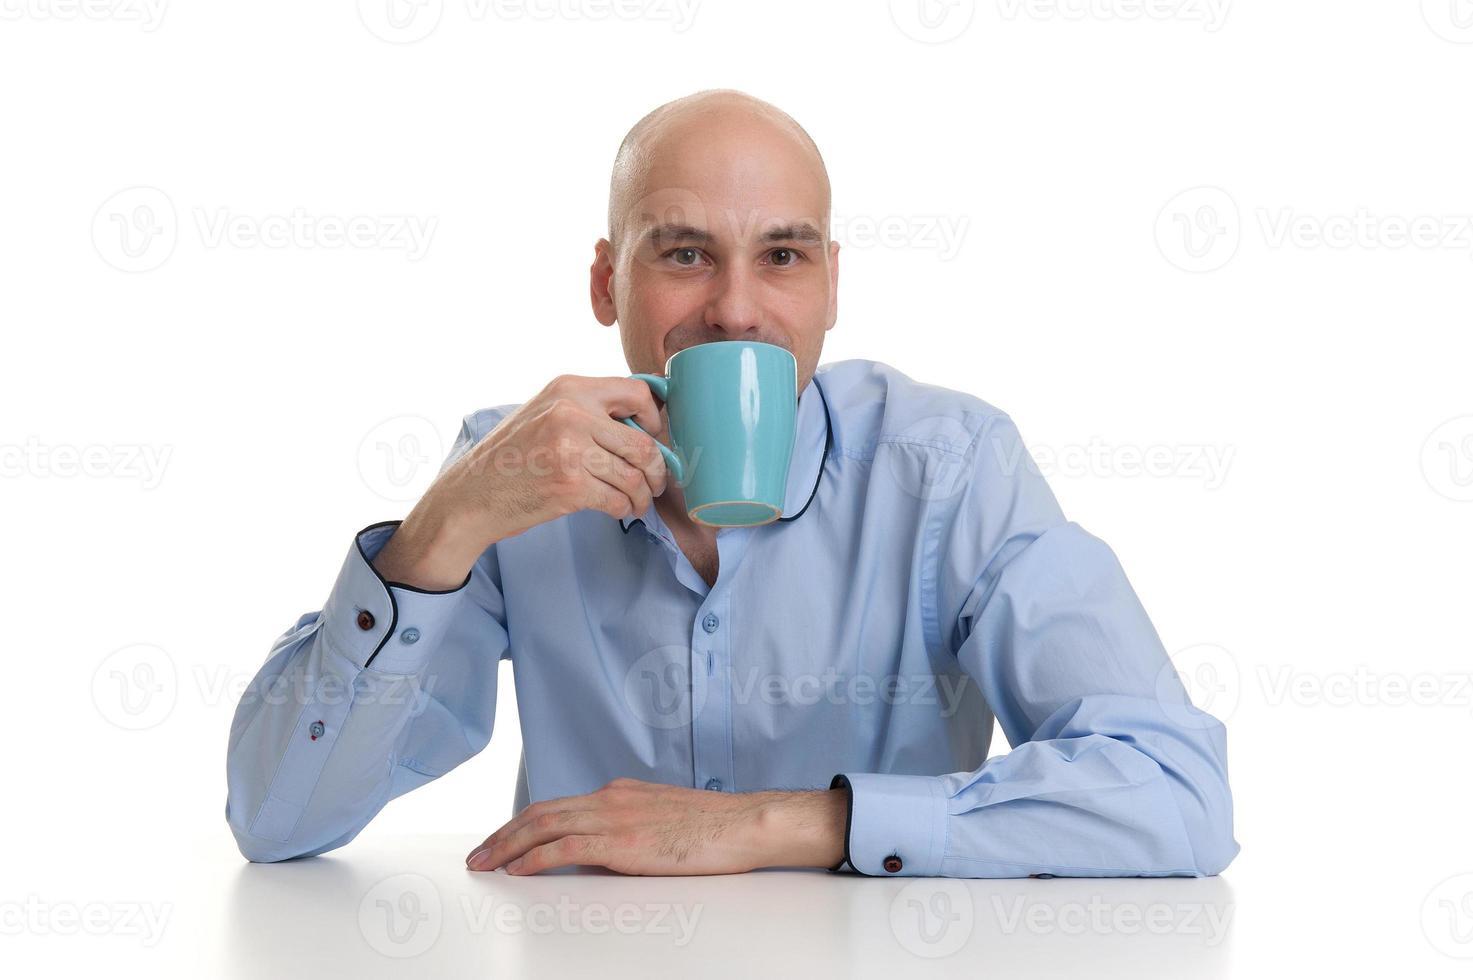 giovane che beve caffè foto